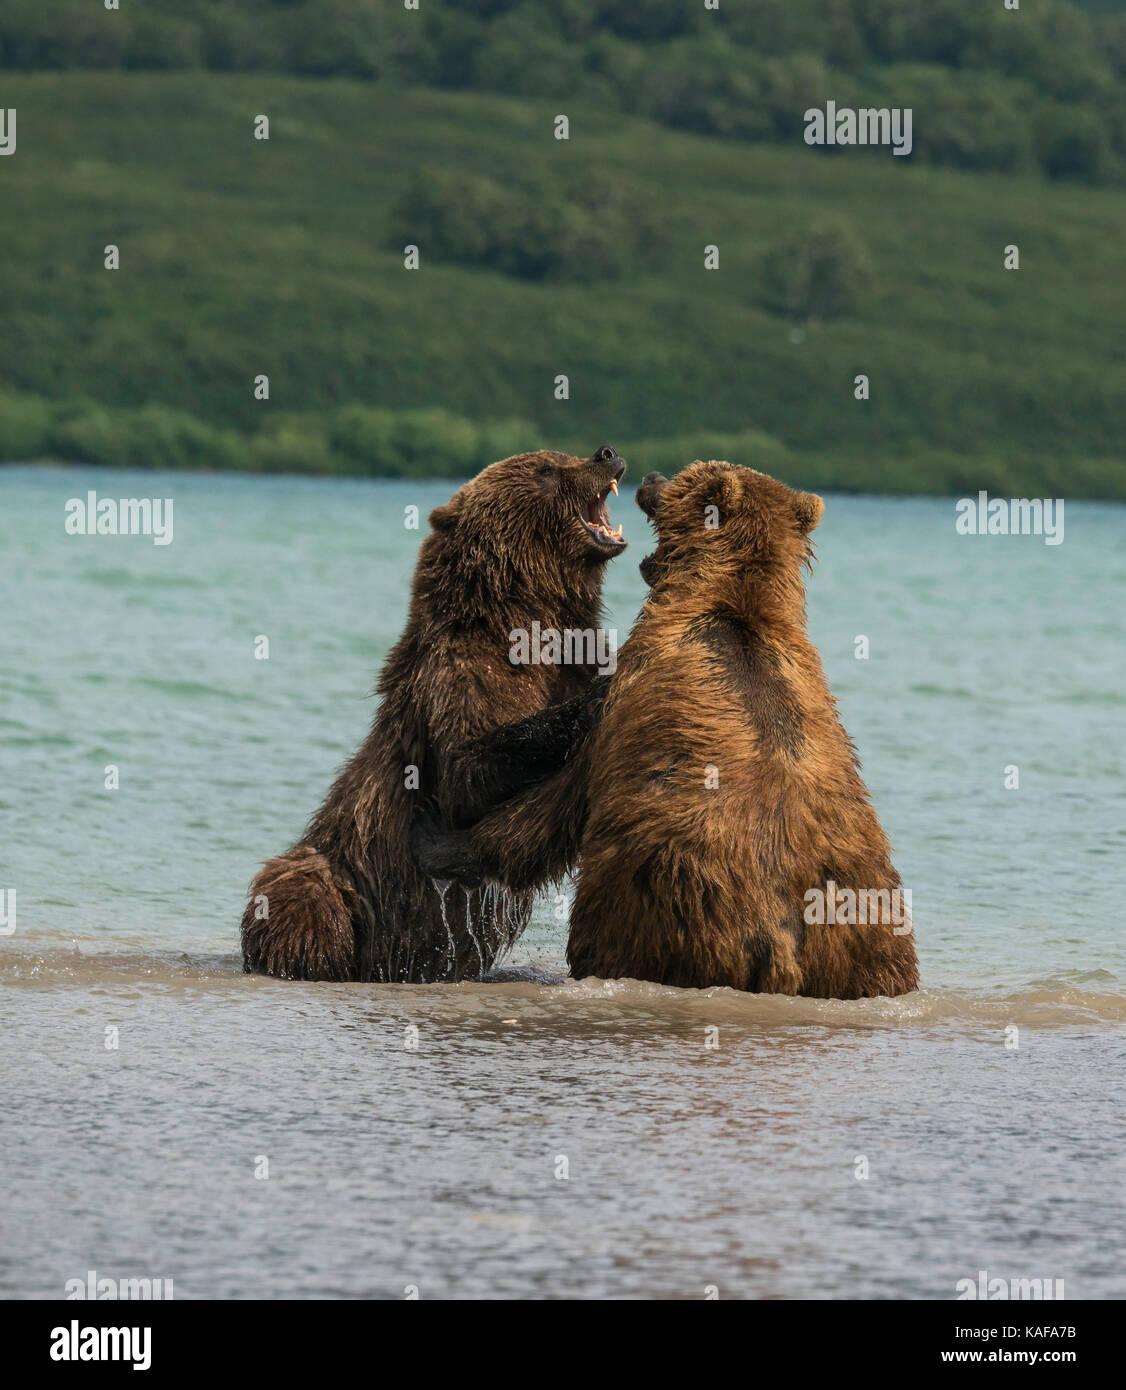 Two male brown bears fighting for dominance, Kuril Lake, Kamchatka, Russia. - Stock Image